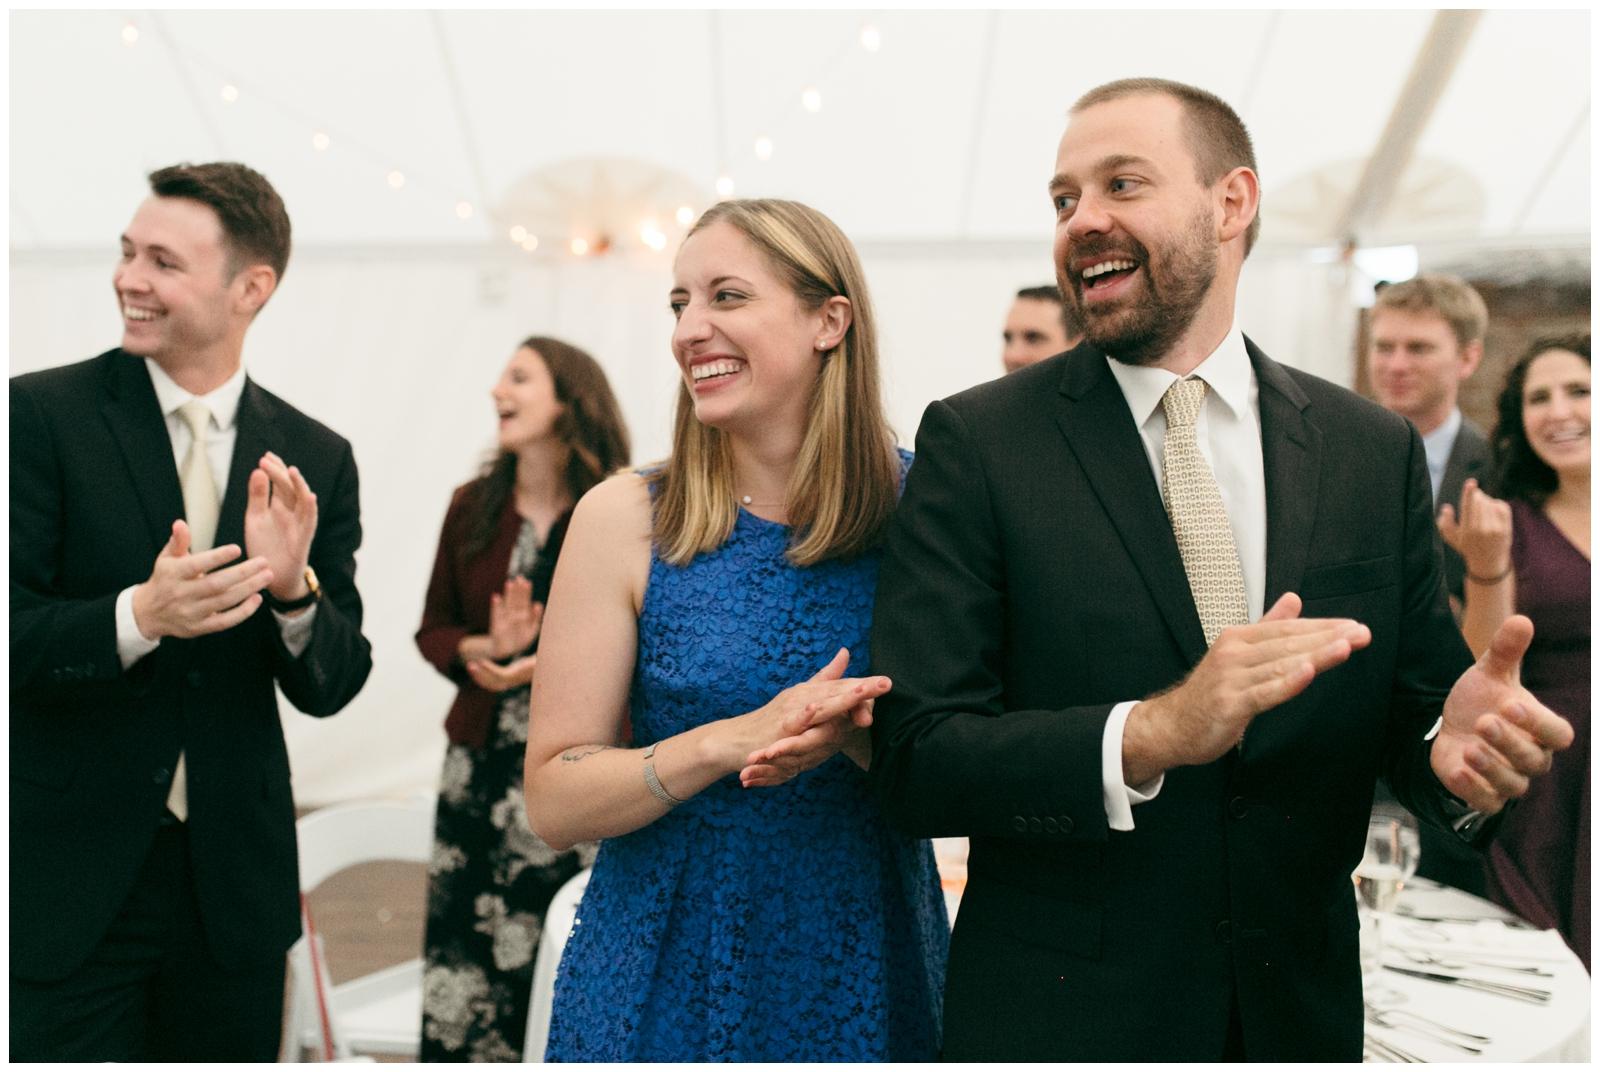 Moraine-Farm-wedding-Bailey-Q-Photo-Massachusetts-wedding-photpgrapher-115.jpg